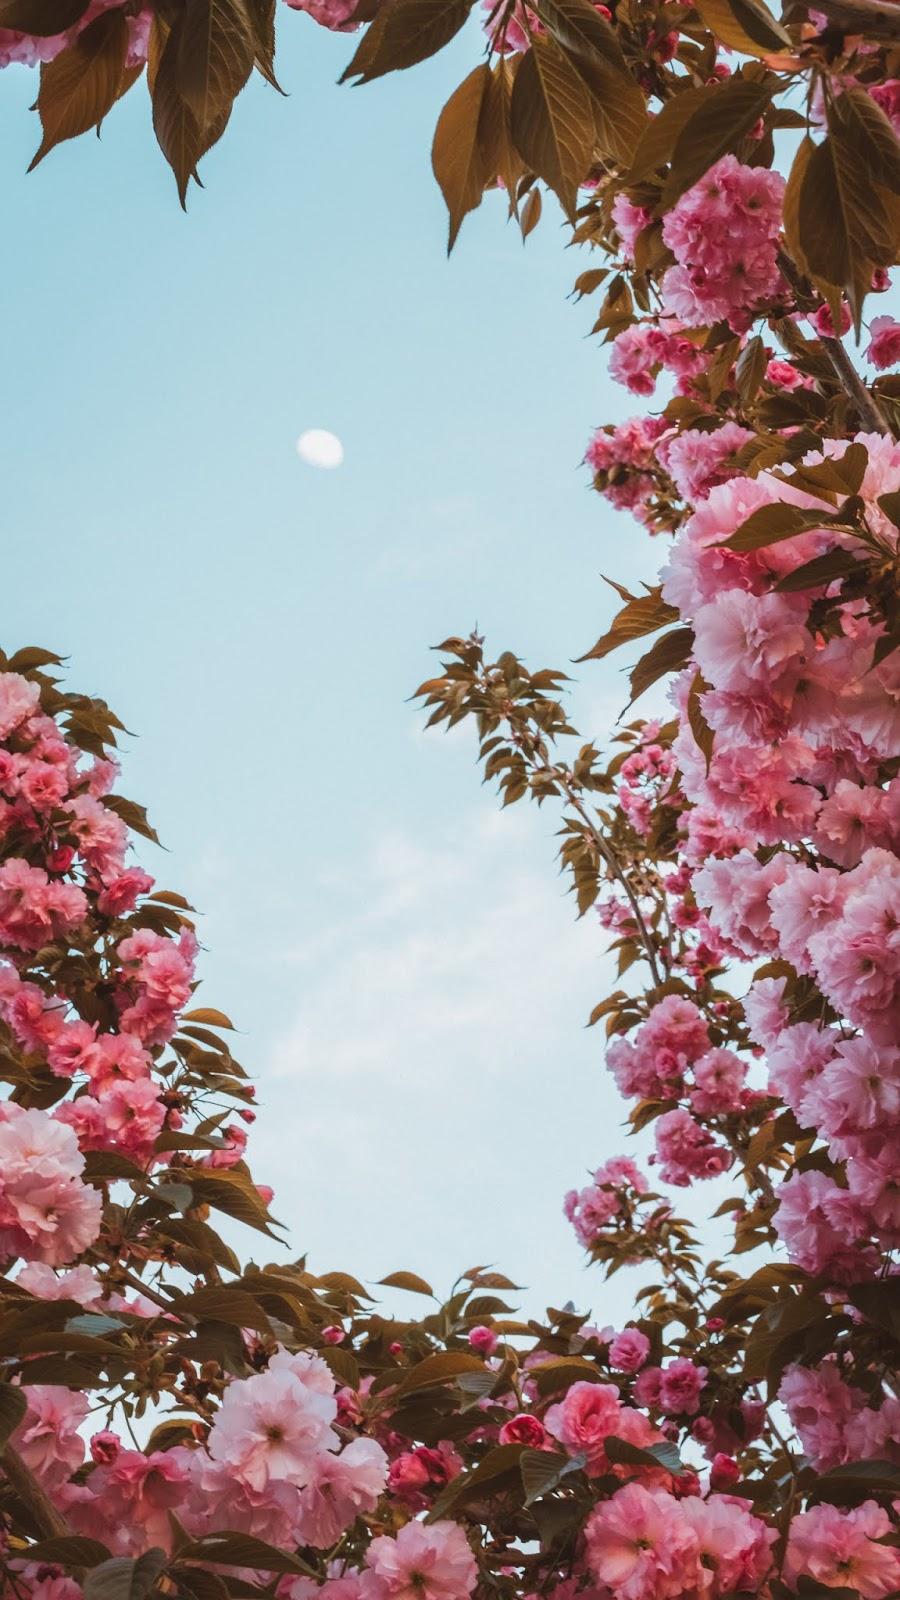 Flowers under sky